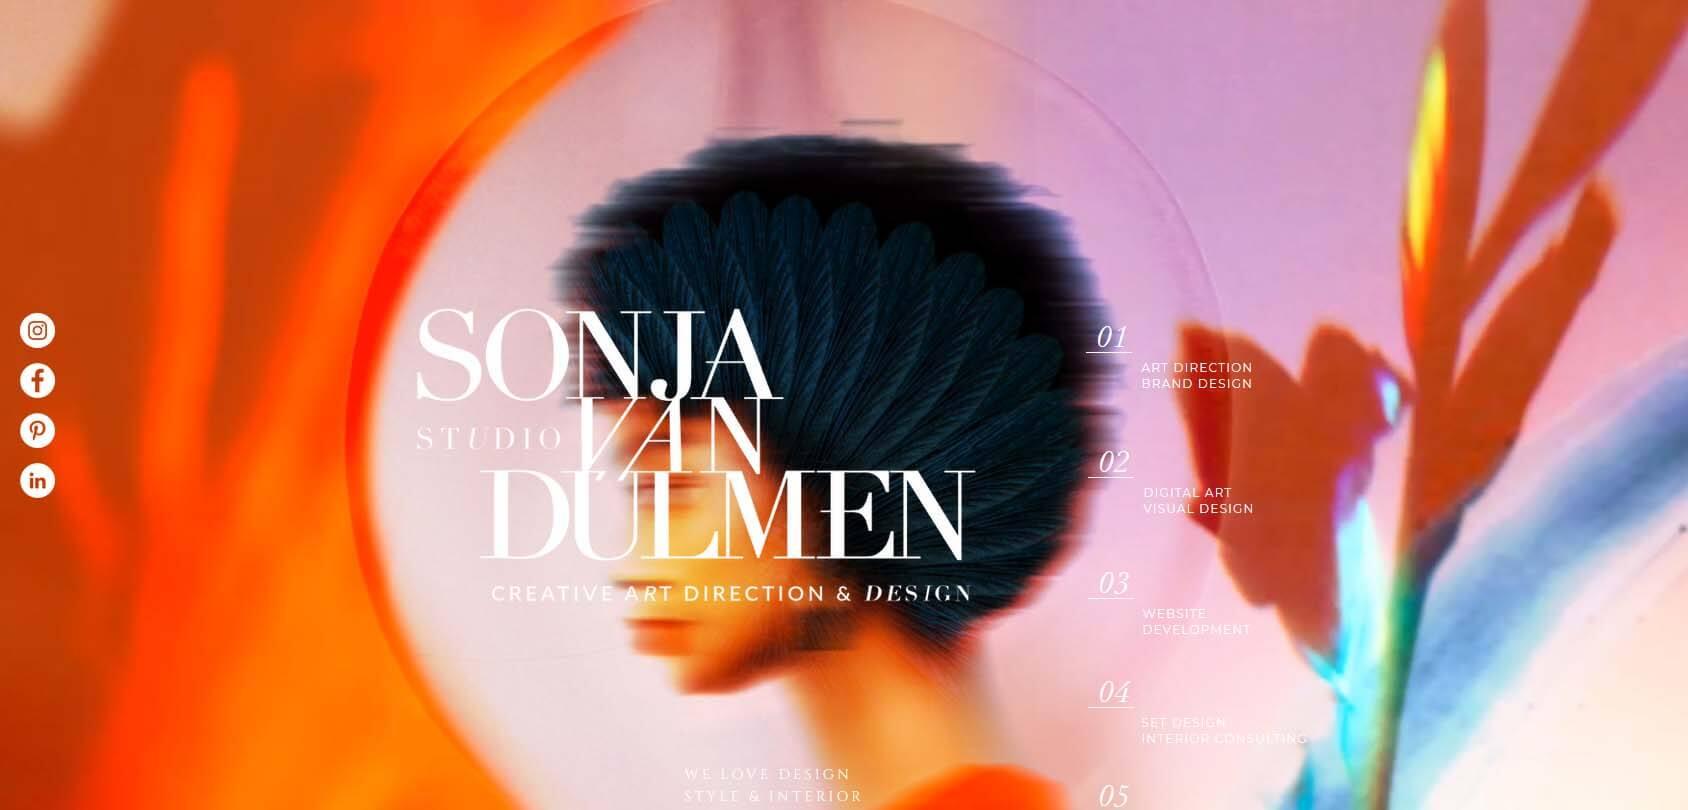 Sonja van Duelmen Homepage